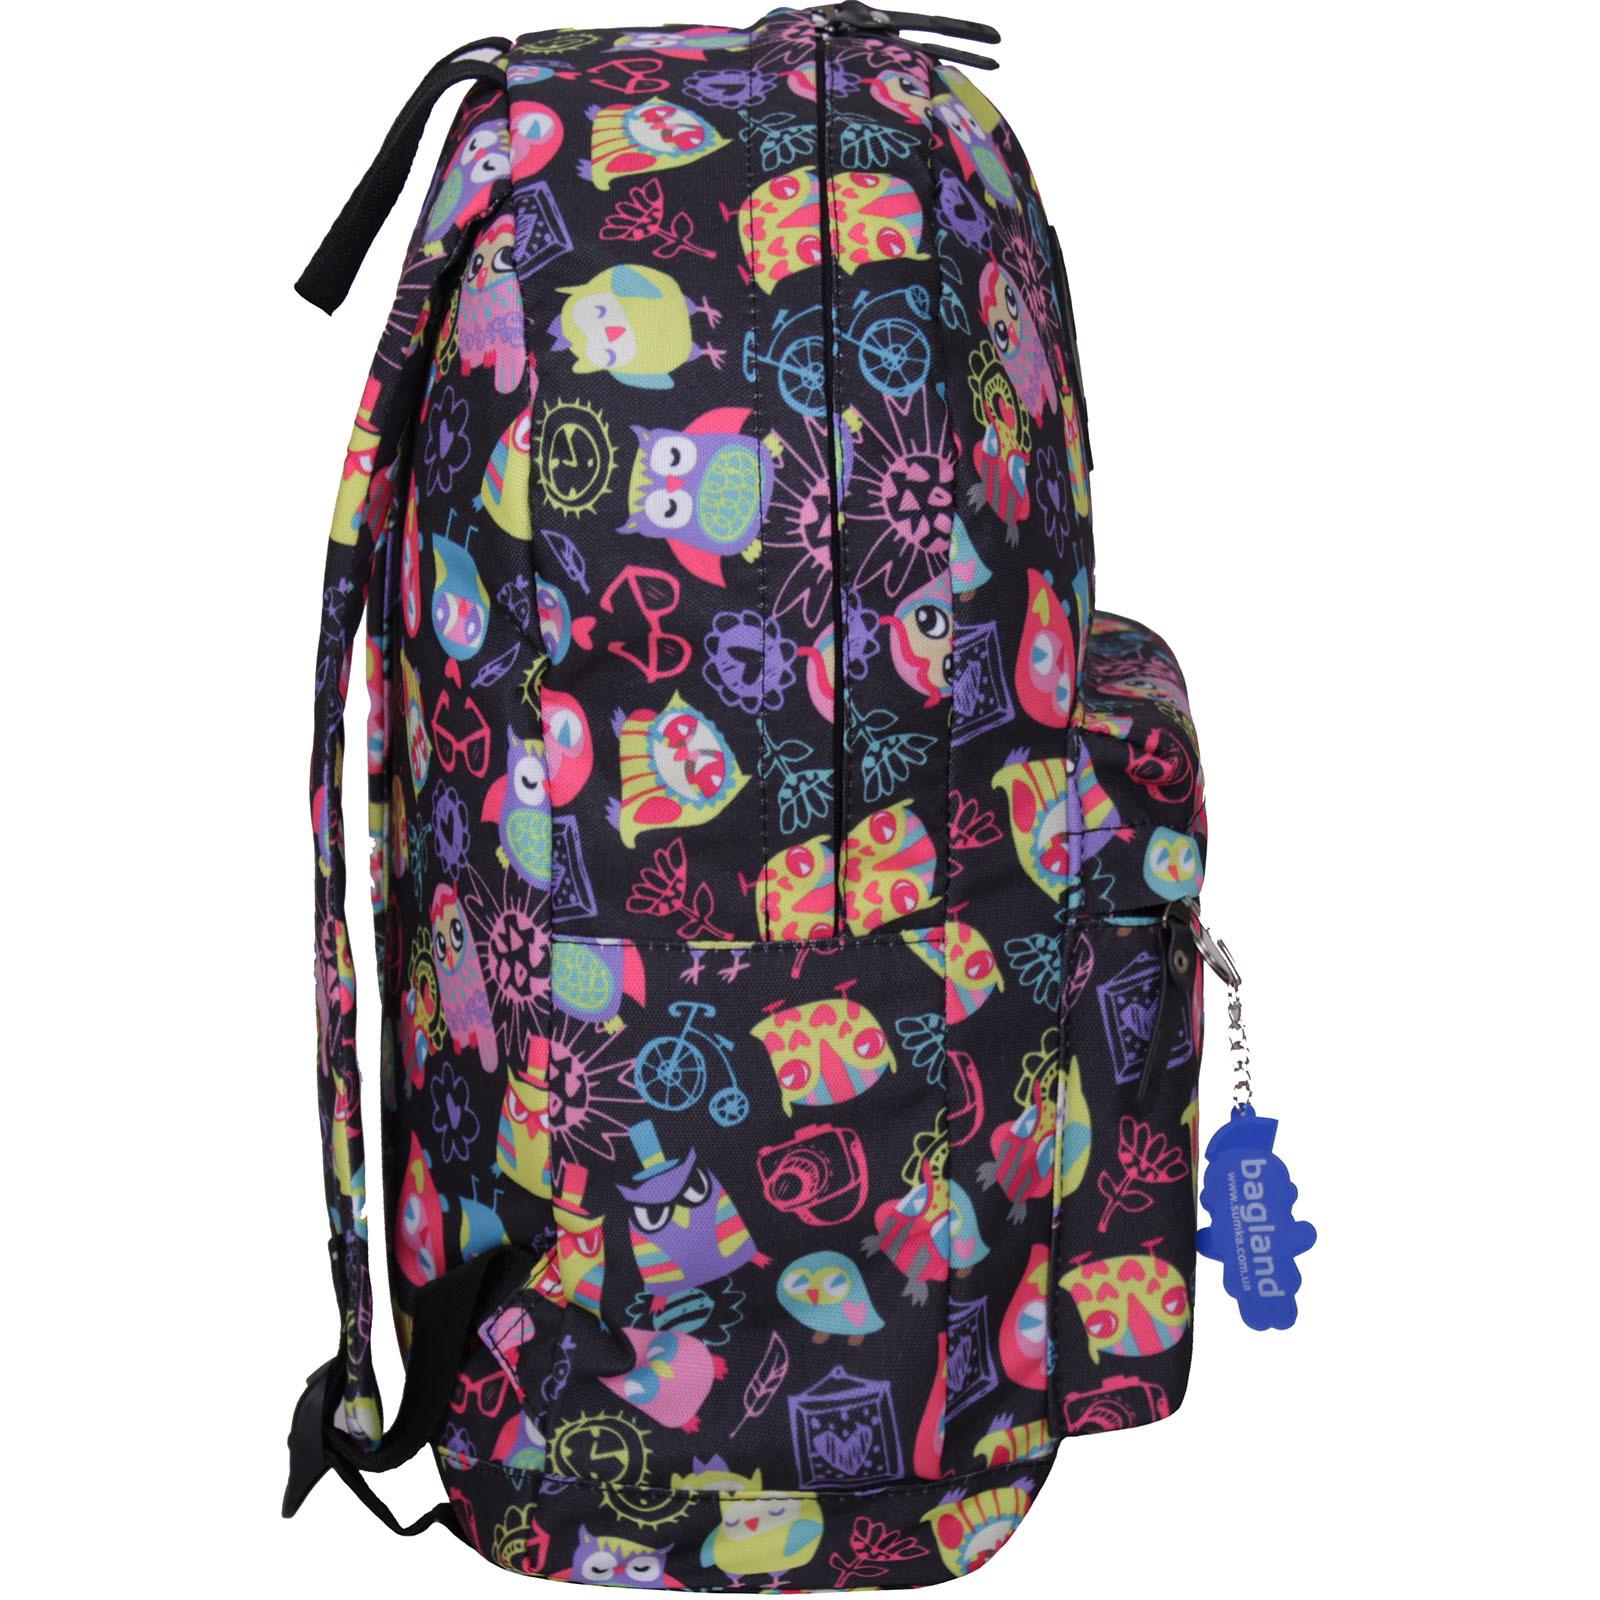 Рюкзак Bagland Молодежный (дизайн) 17 л. сублимация (45) (00533664)